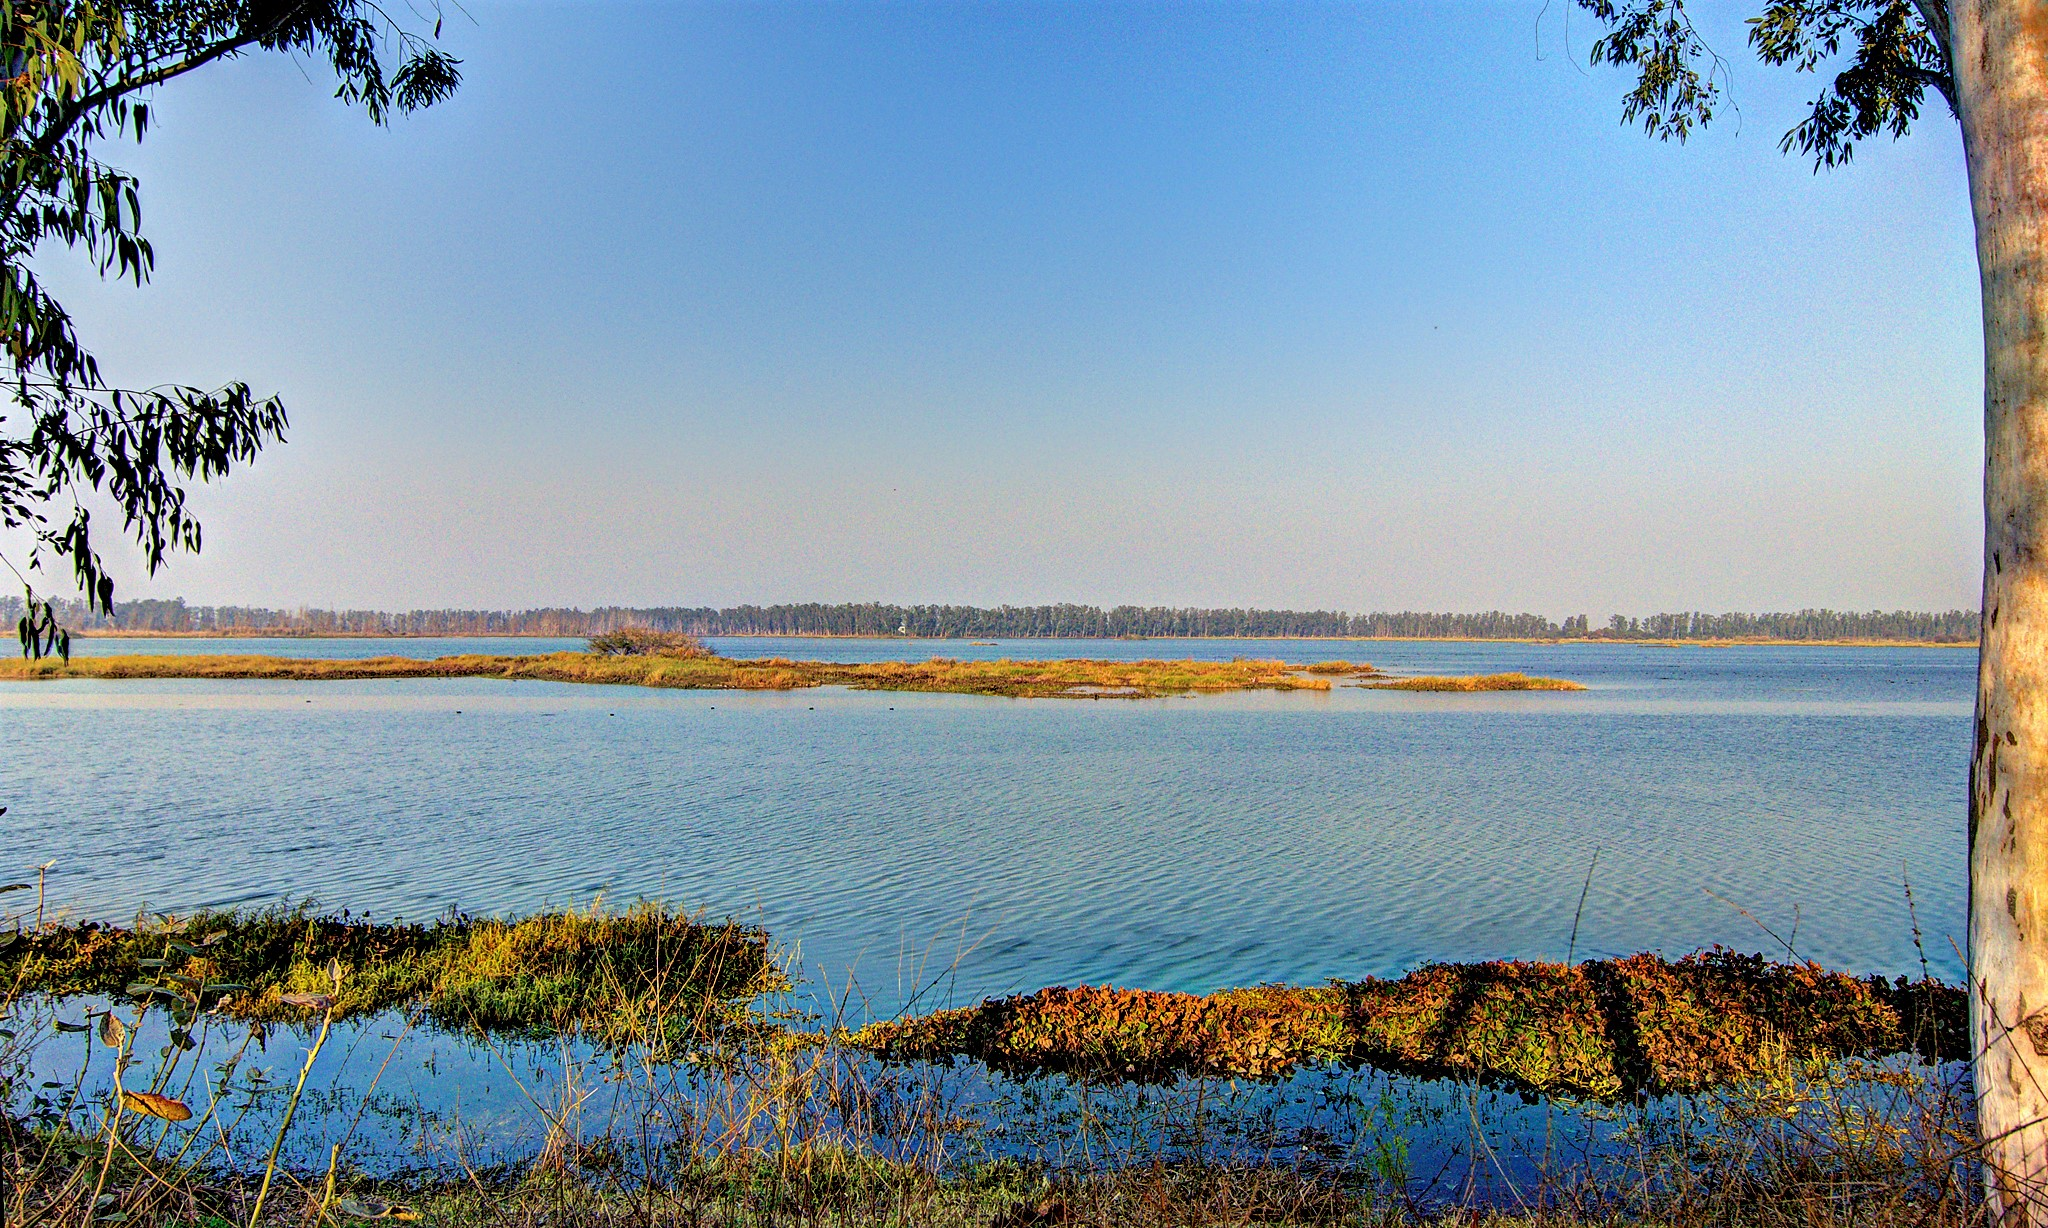 AMAZING PLACES AROUND DELHI - BHINDAWAS LAKE